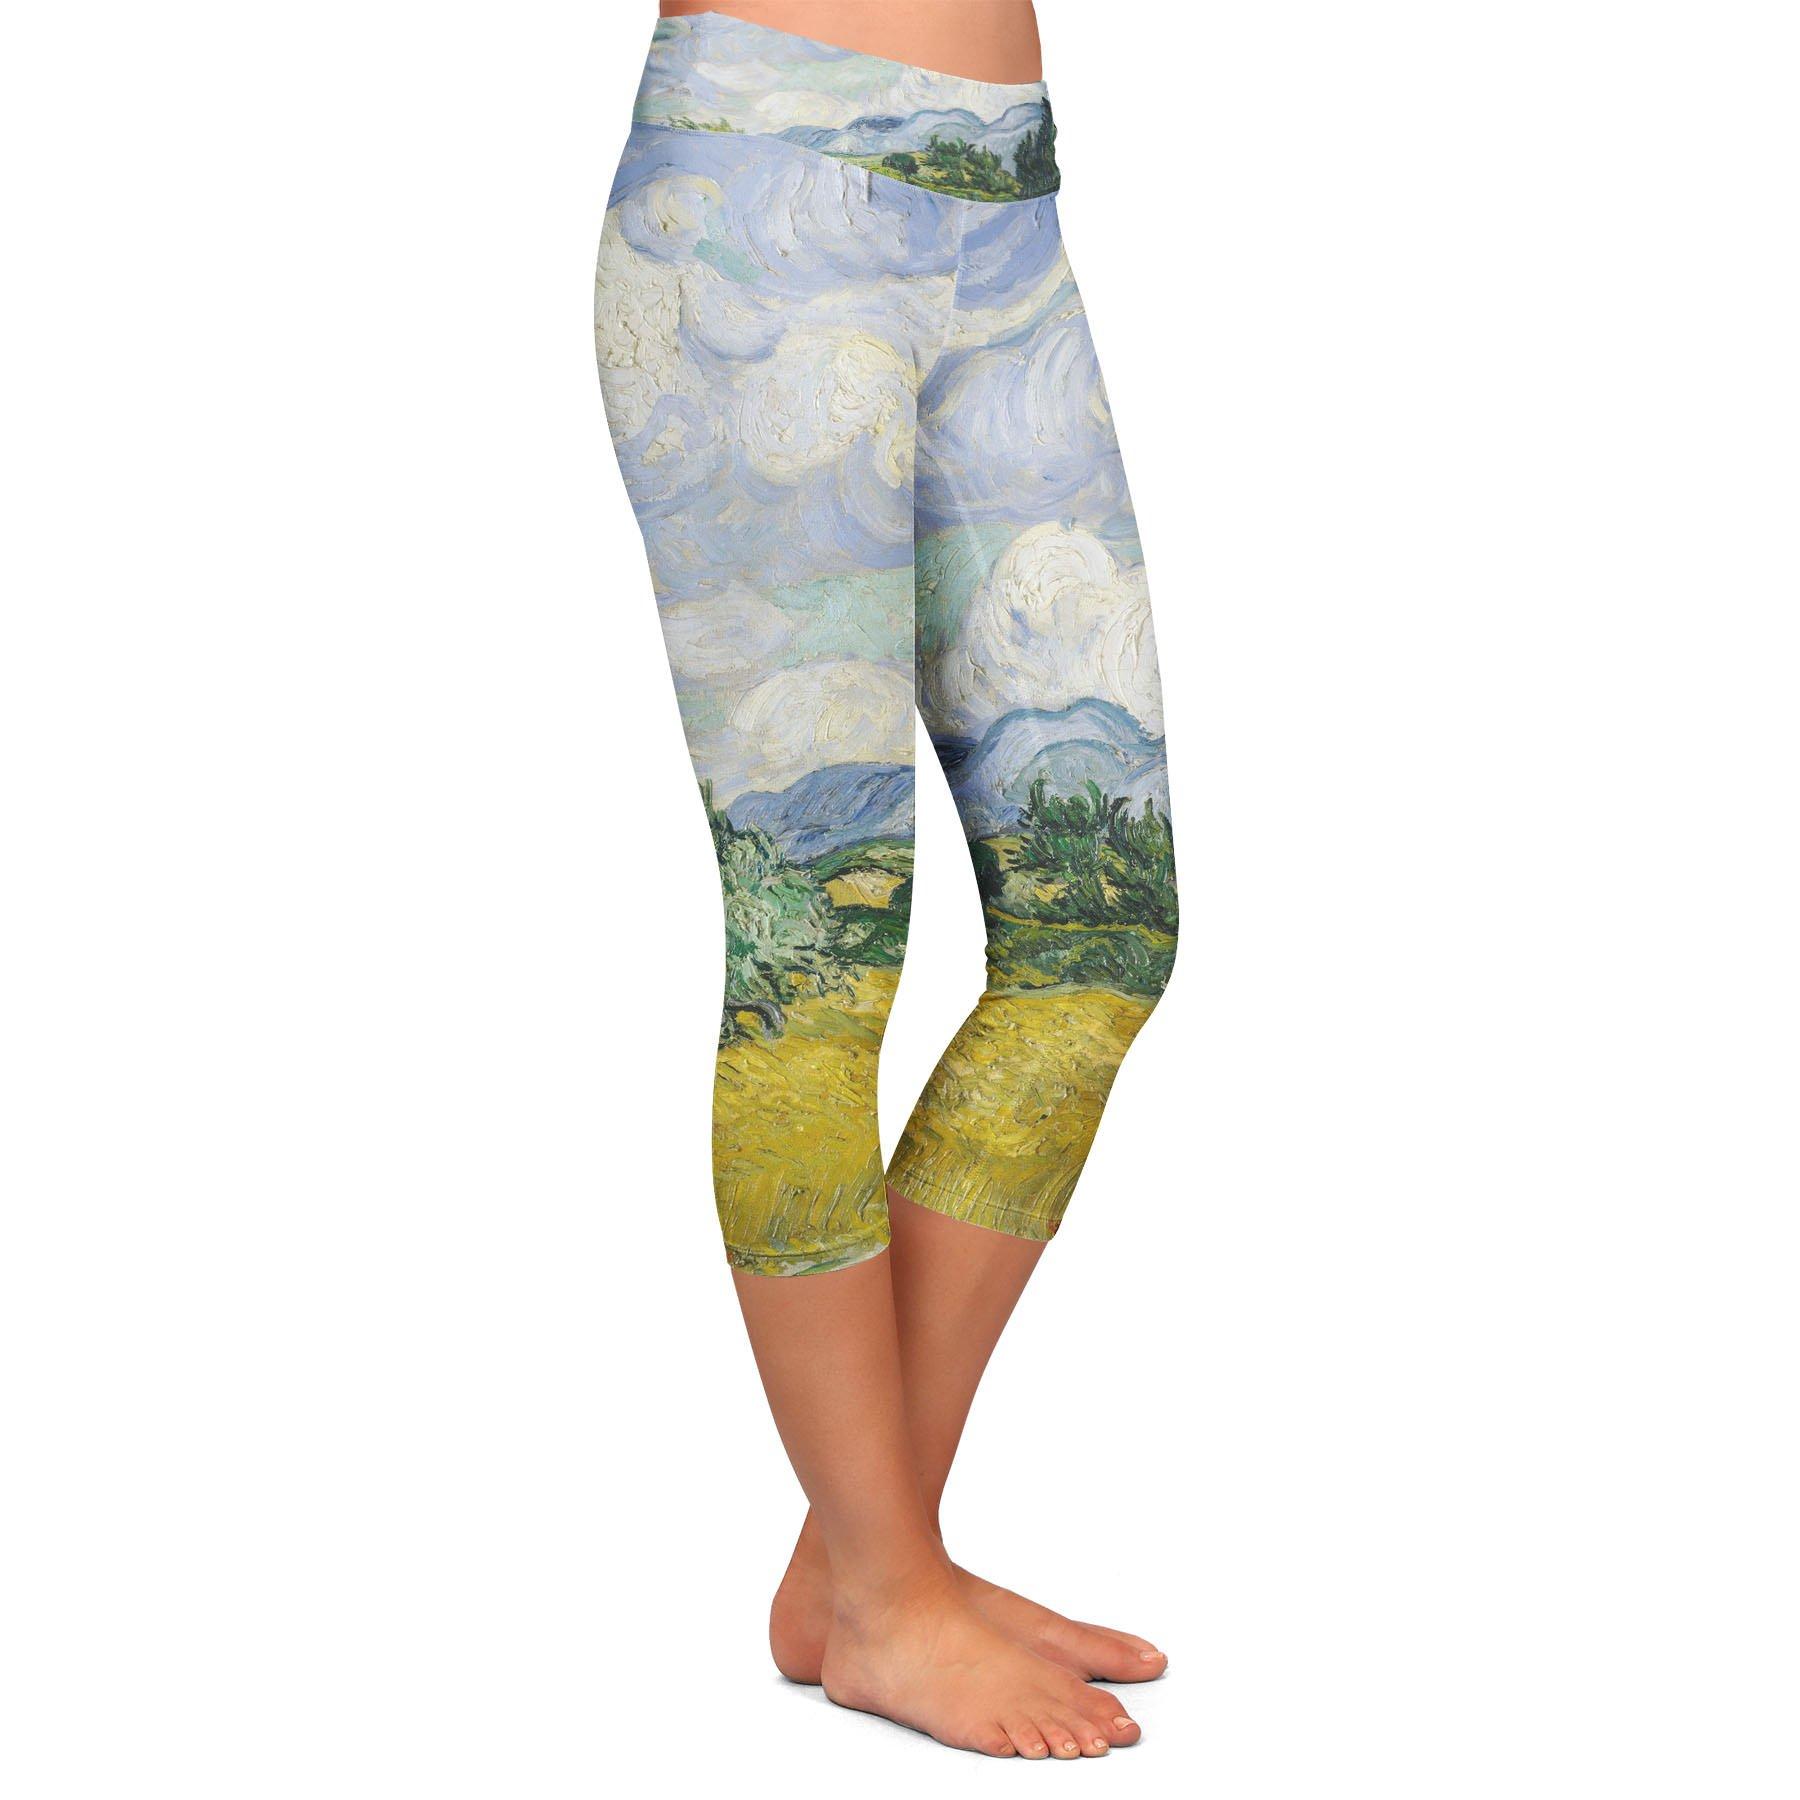 Vincent Van Gogh Fine Art Painting Yoga Leggings - Capri 3/4 Length, Low Waist by Queen of Cases (Image #2)